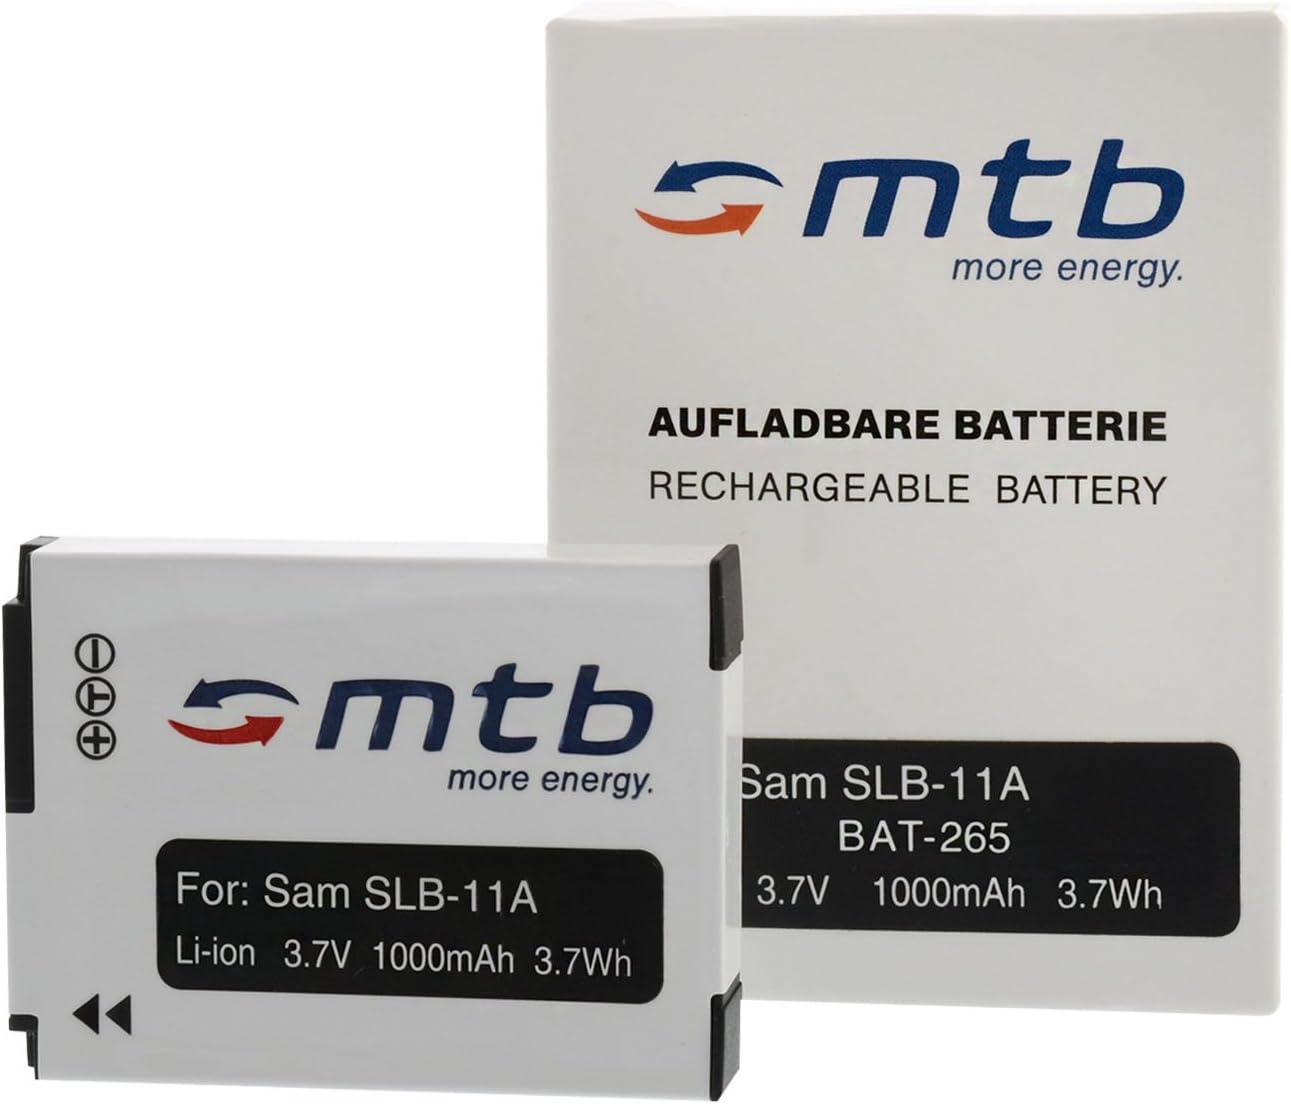 HZ50W Ver Lista! Coche//Corriente 2 Bater/ìas para Samsung SLB-11A // EX1 WB5500 TL500 Cargador